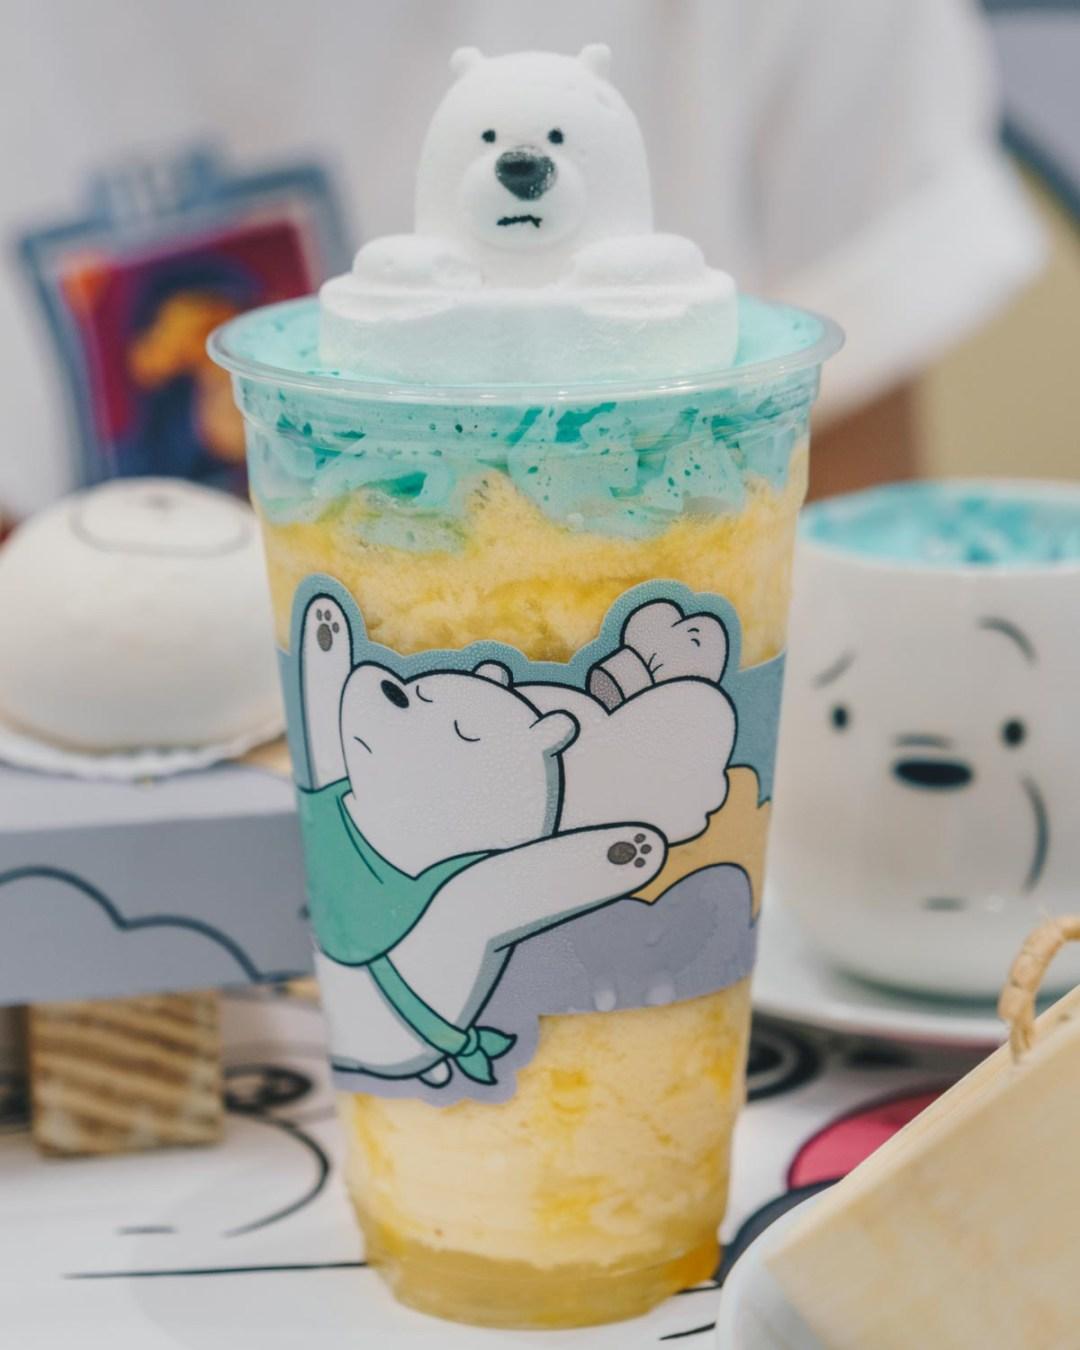 We Bare Bears Cafe - Mango Tango Frappe